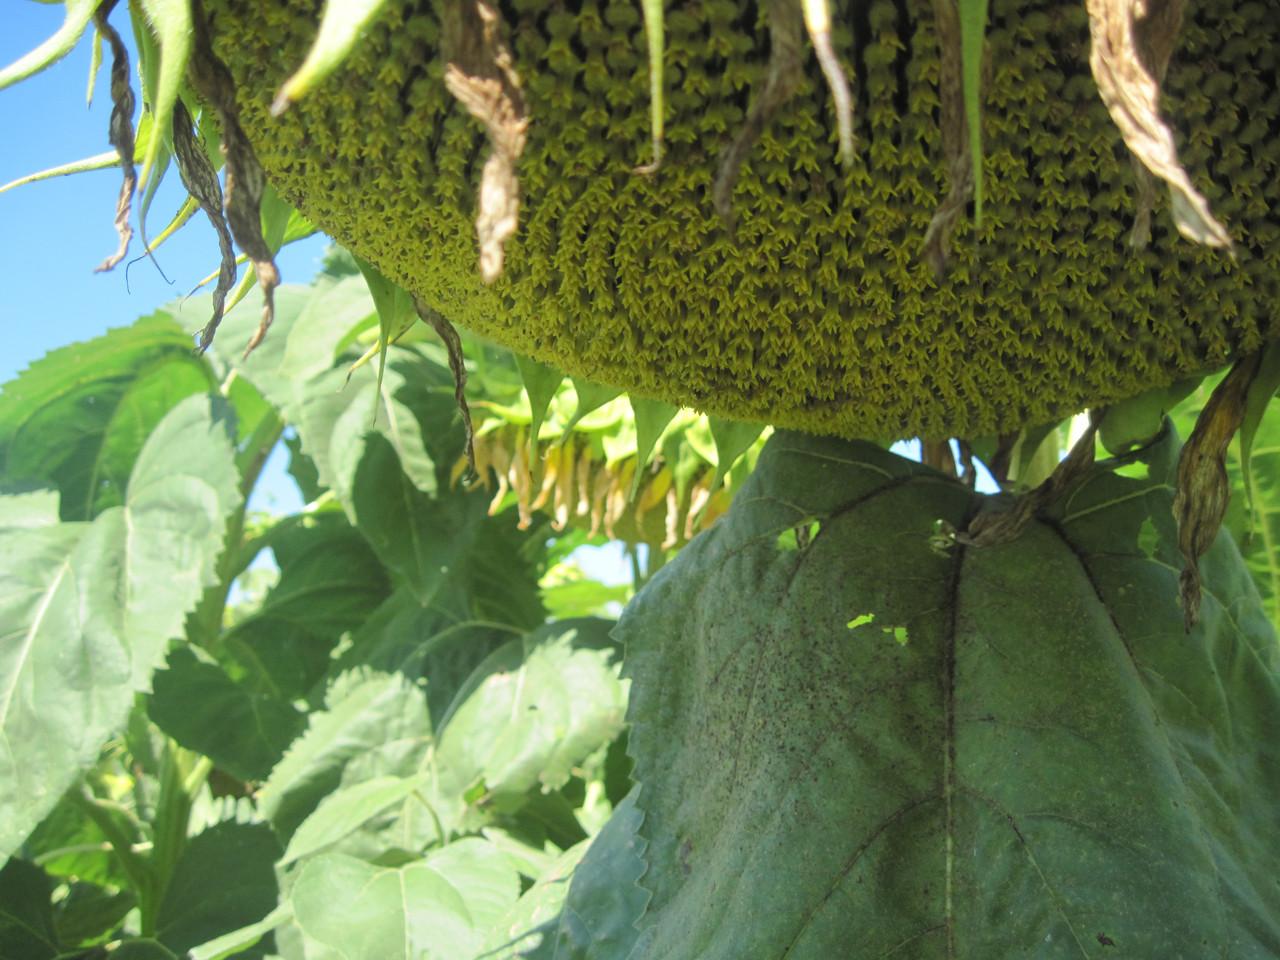 Семена подсолнечника Дарил, устойчив к шести расам заразихи A-F, Оригинатор: Маисадур Семенсес, Стандарт / АСП